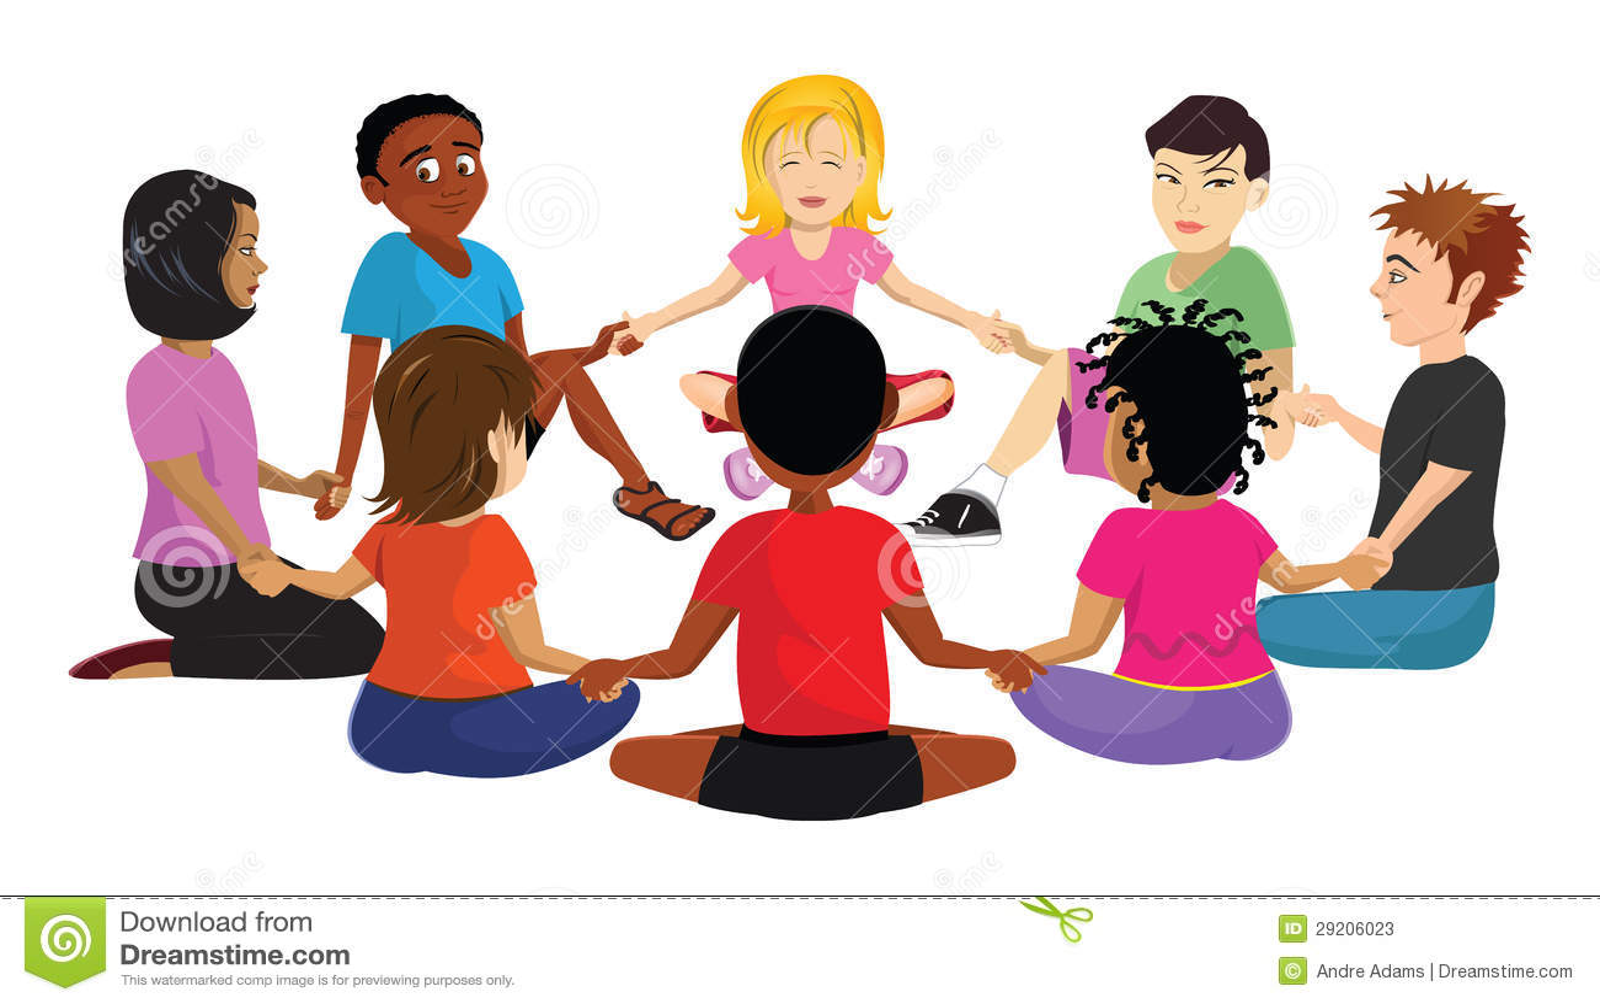 Kinder sitzen im kreis clipart  Kinder Kreis Sitzen Stock Illustrationen, Vektors, & Klipart – (29 ...